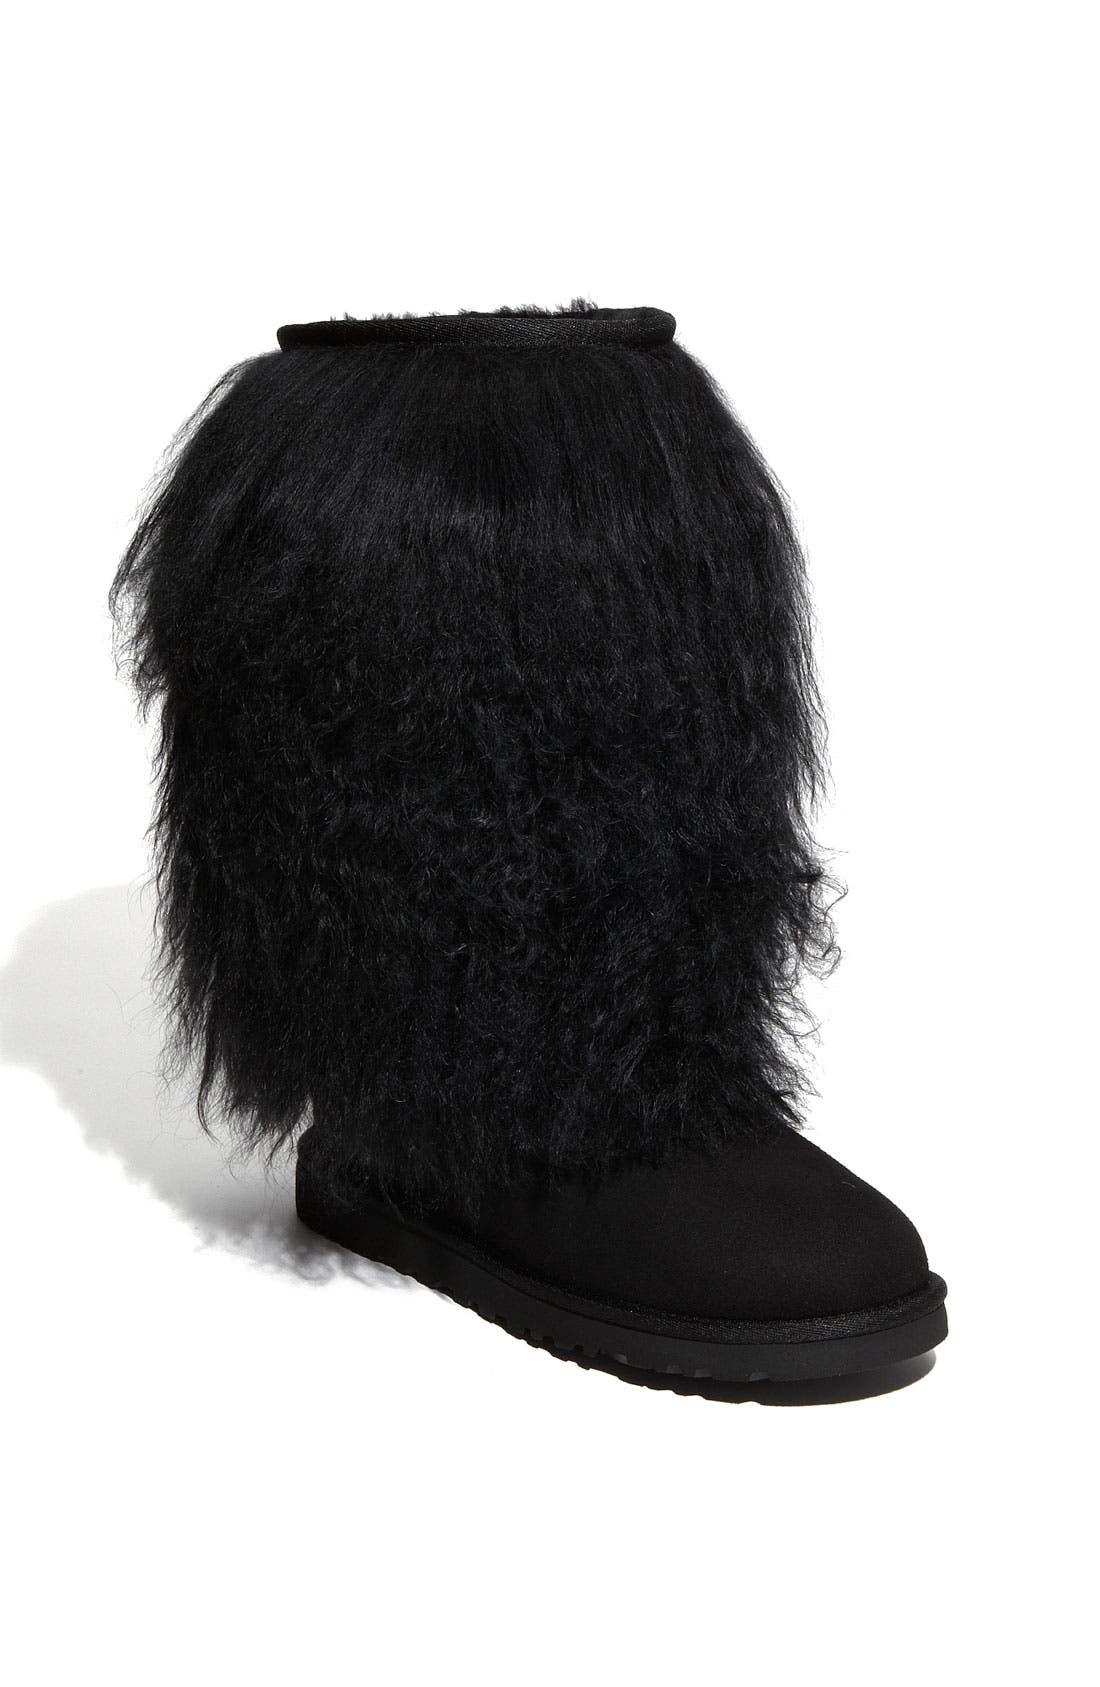 Main Image - UGG® Australia 'Tall' Shearling Cuff Boot